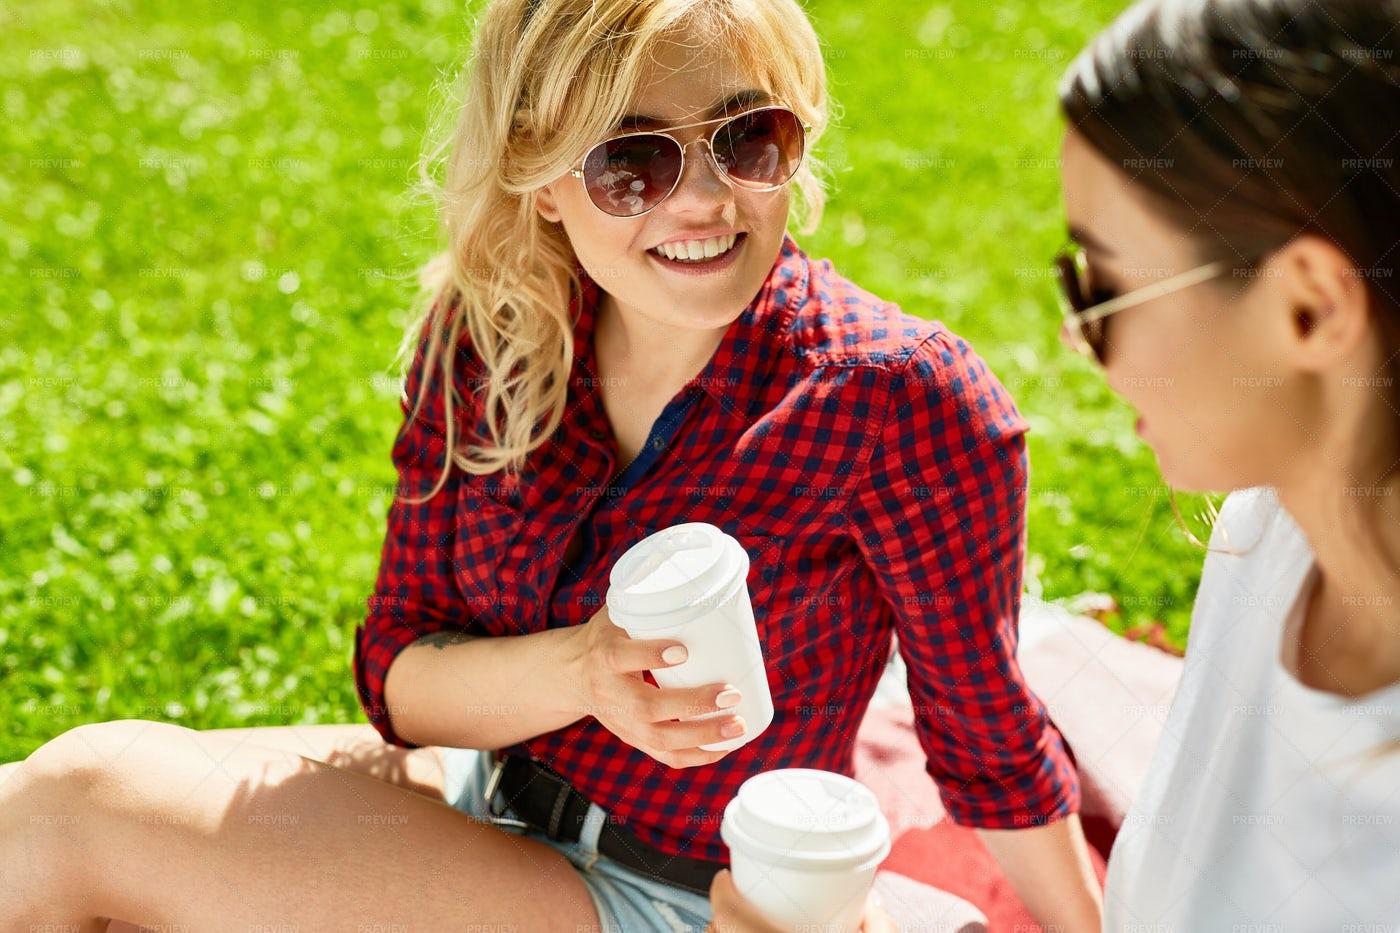 Girls At Leisure: Stock Photos